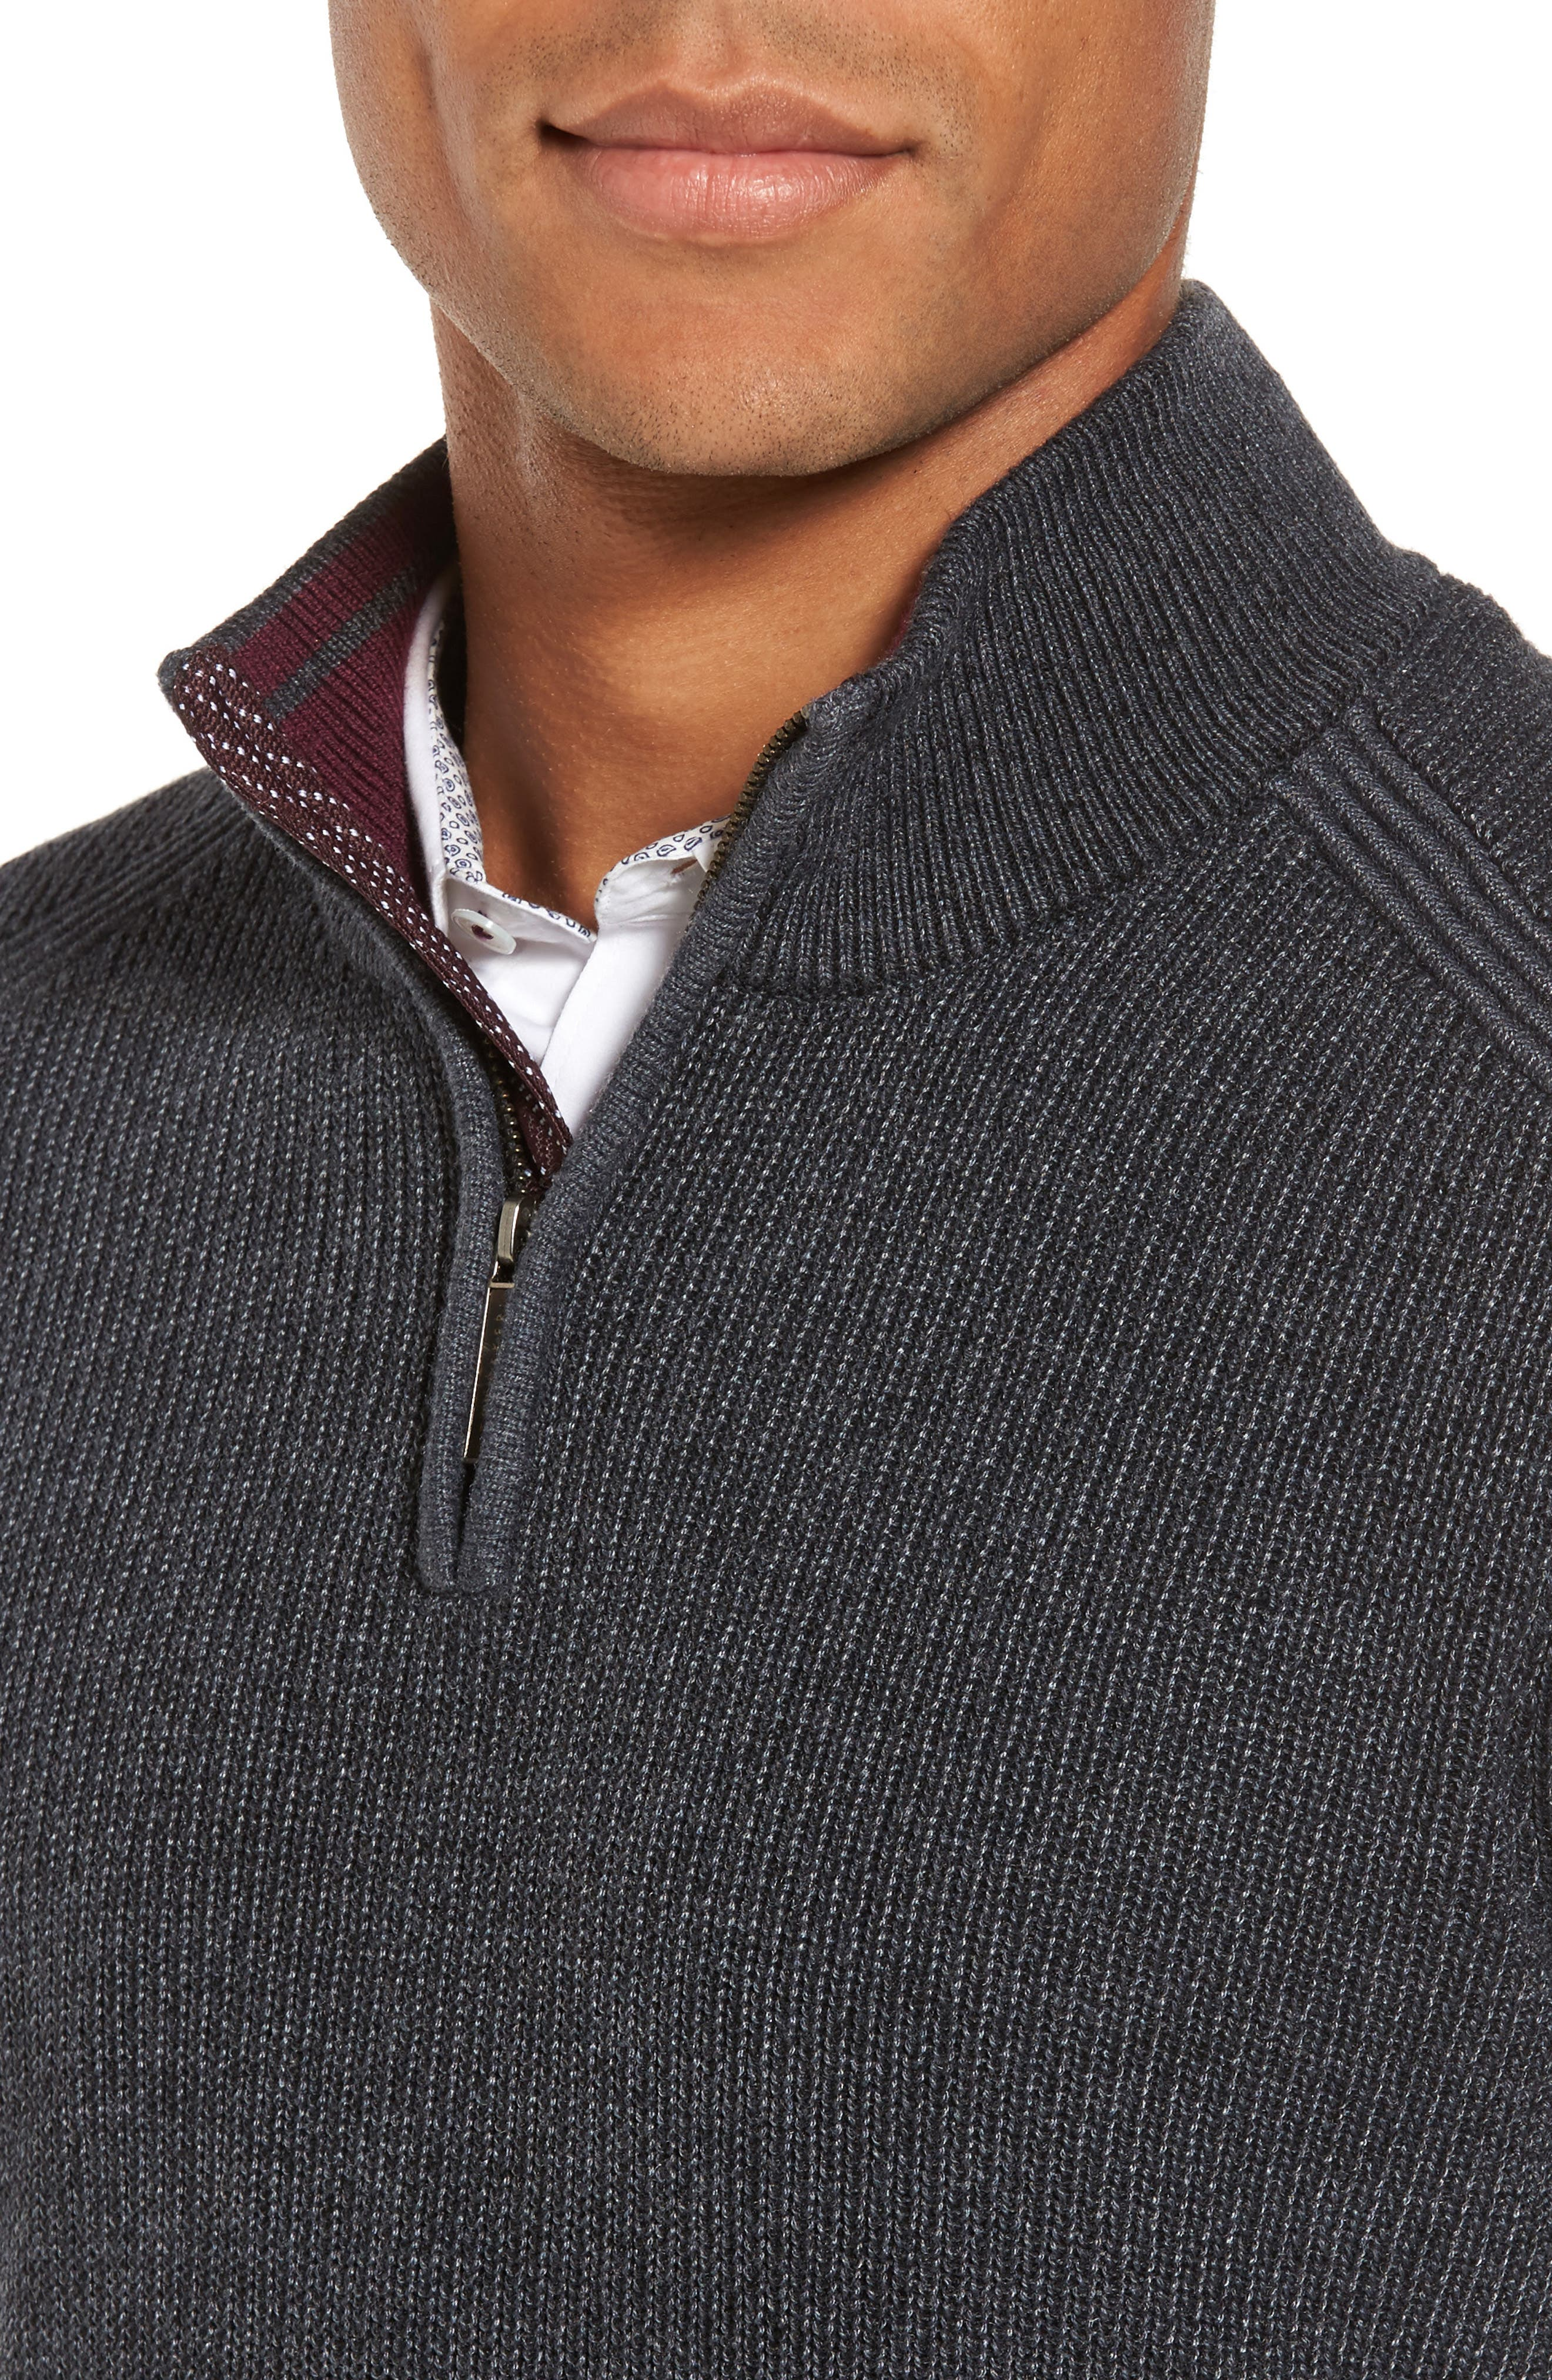 Stach Quarter Zip Sweater,                             Alternate thumbnail 4, color,                             010